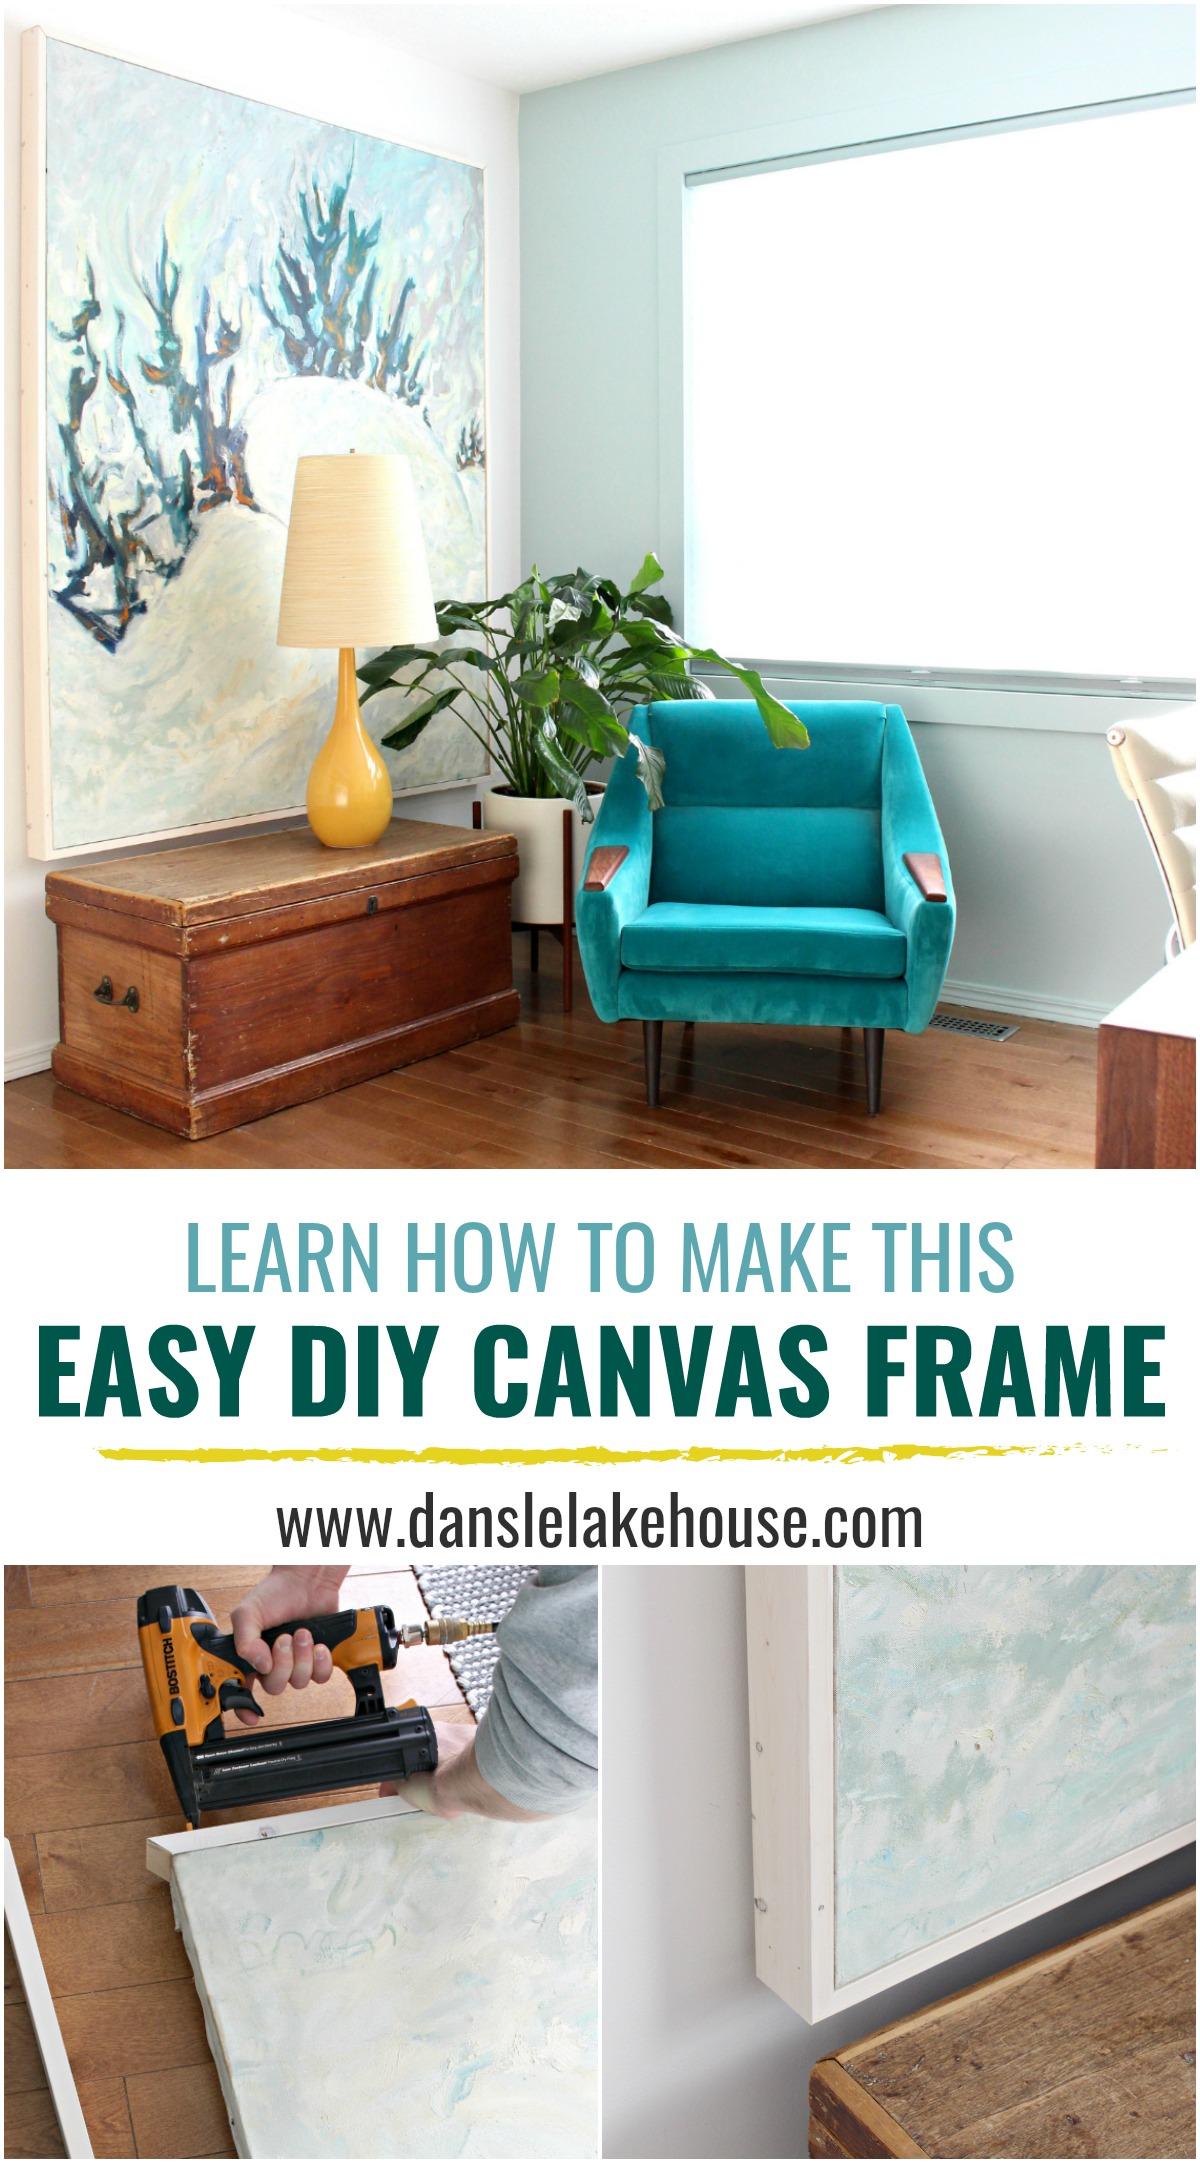 How to Frame Art for Cheap | Easy DIY Canvas Frame #woodworking #diy #diyframe #savemoney #budgethomedecor